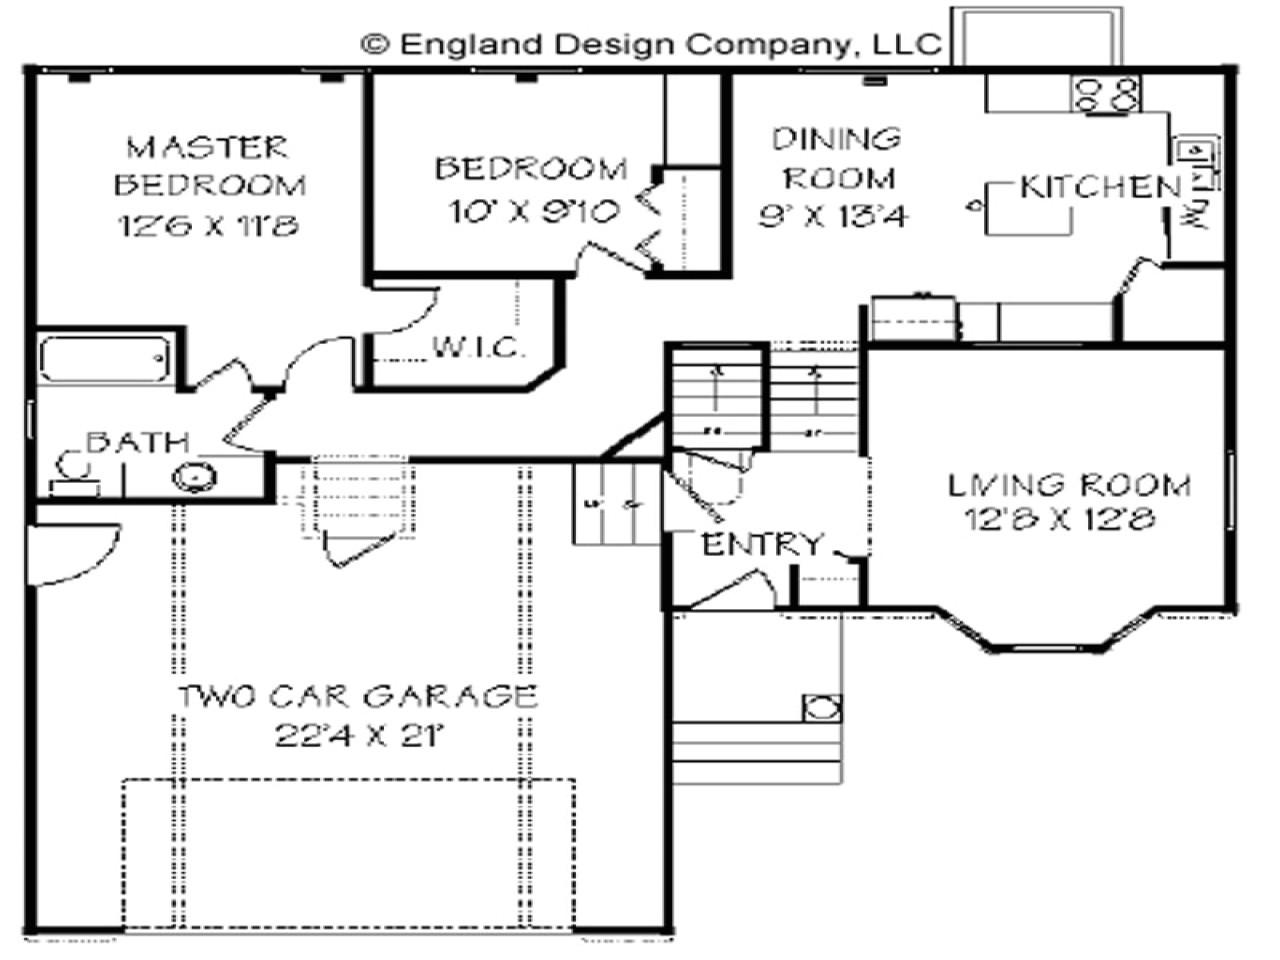 22c21aeb0845d553 home level split house plans bi level house